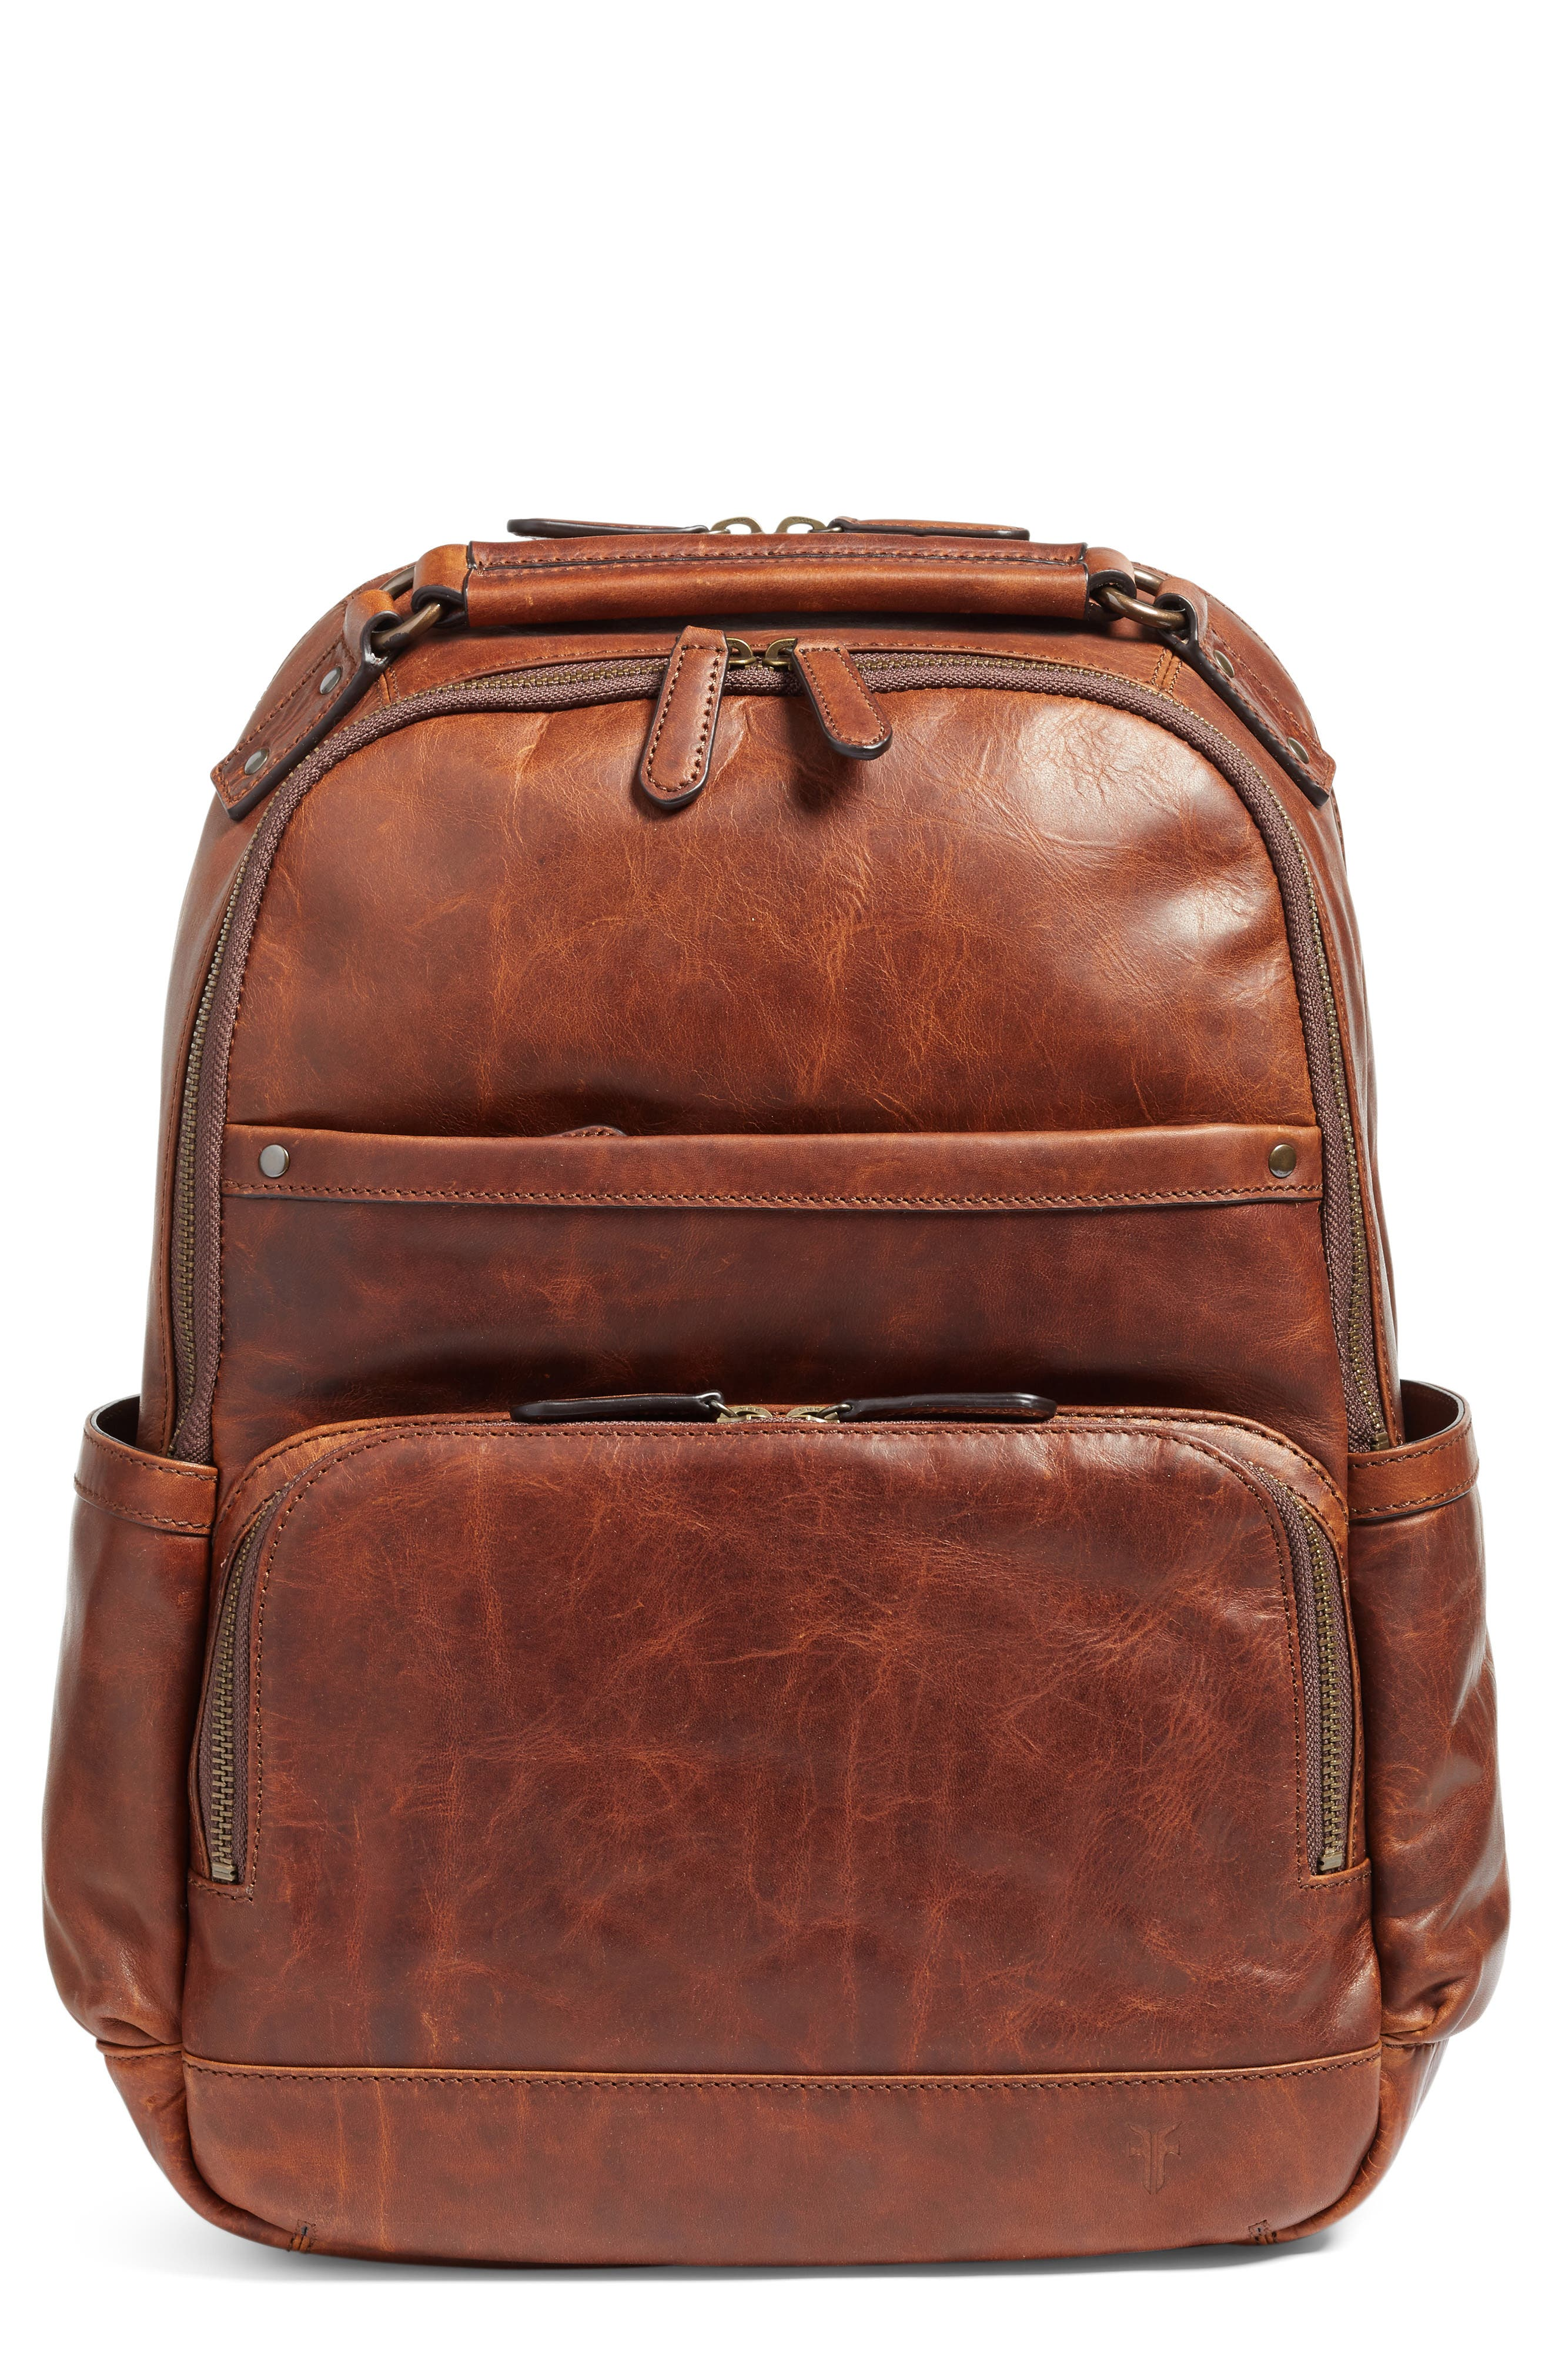 Main Image - Frye 'Logan' Leather Backpack